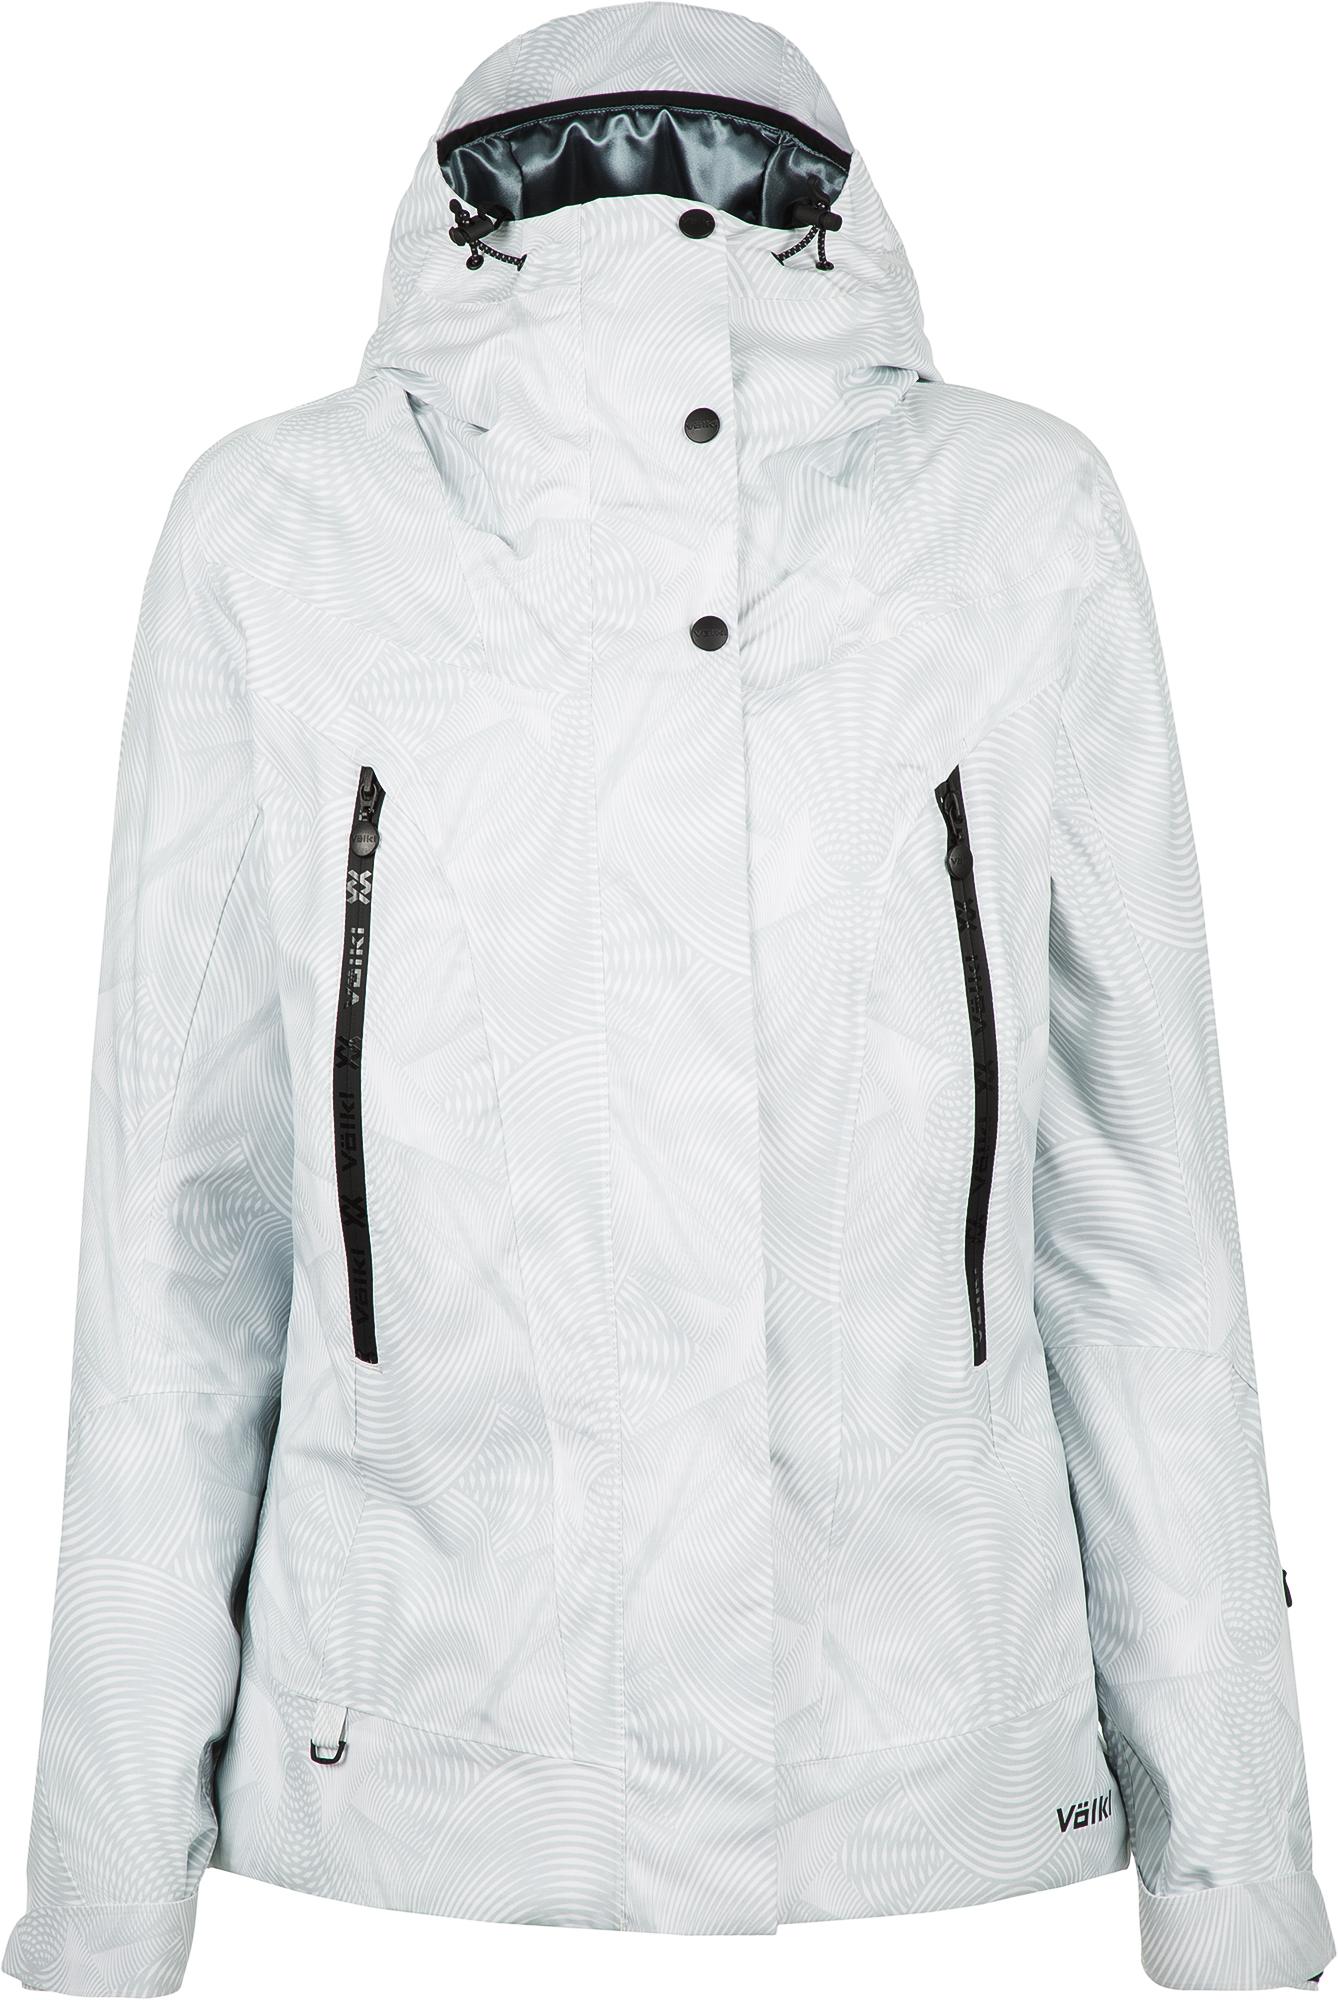 цена Volkl Куртка утепленная женская Volkl, размер 50 онлайн в 2017 году